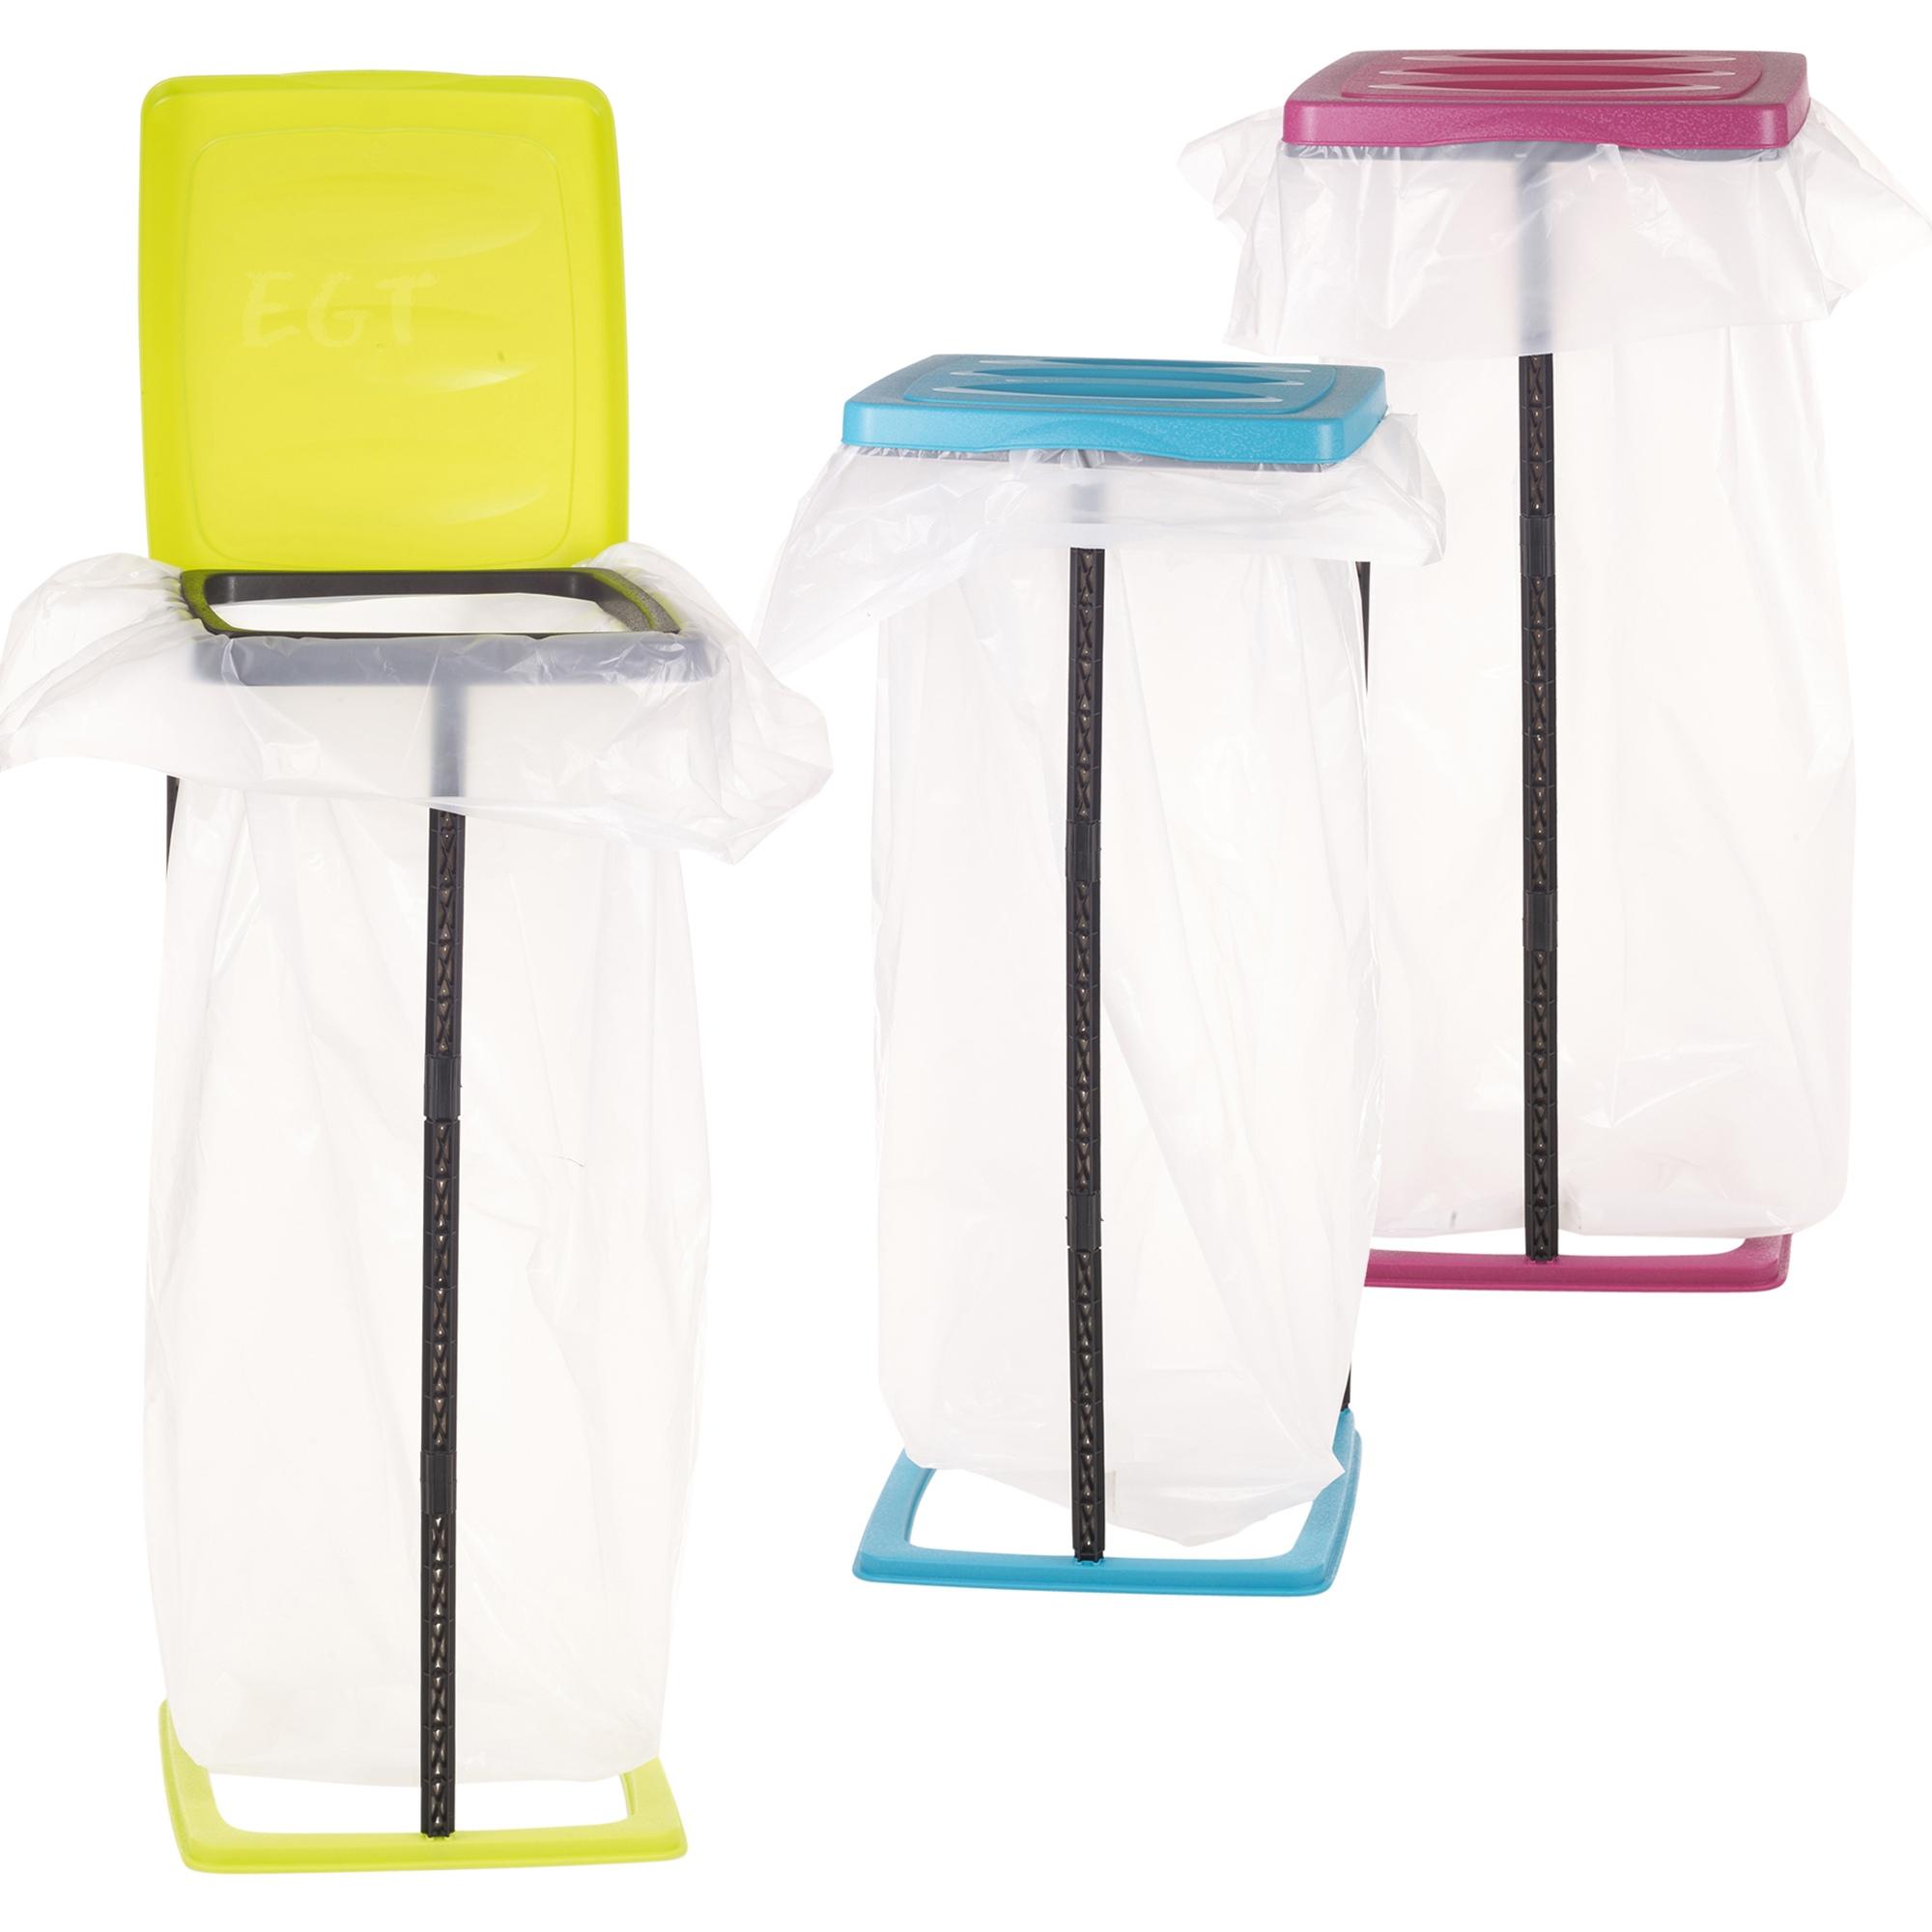 60l collapsible bin bag stand plastic garbage waste rubbish refuse sack holder ebay - Collapsible trash bins ...